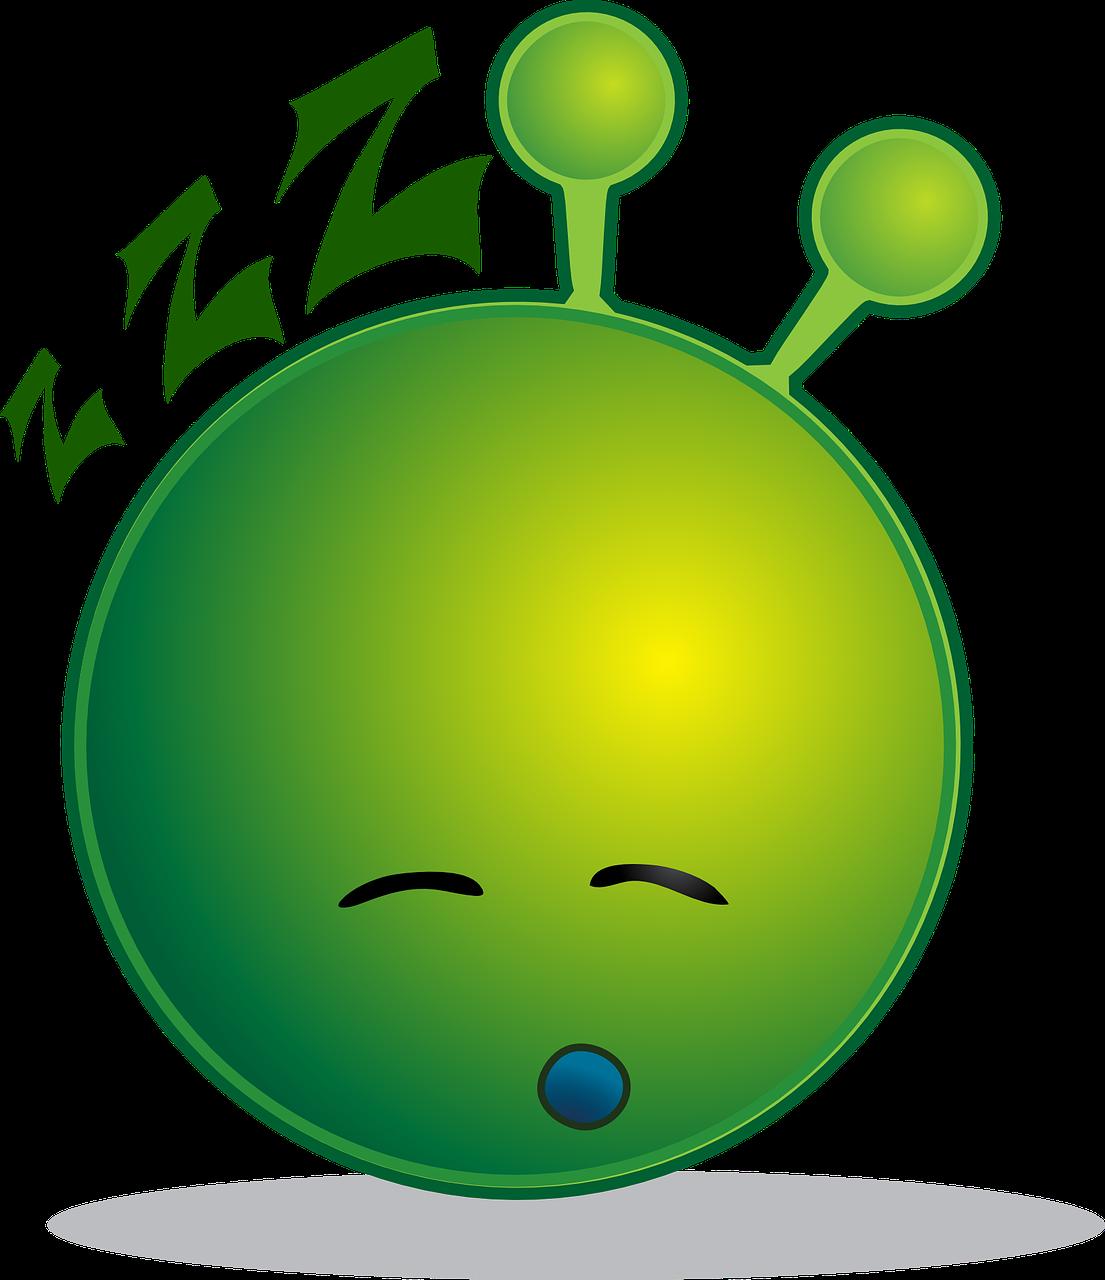 Alien,smiley,sleepy,emoji,emotions - free photo from needpix com